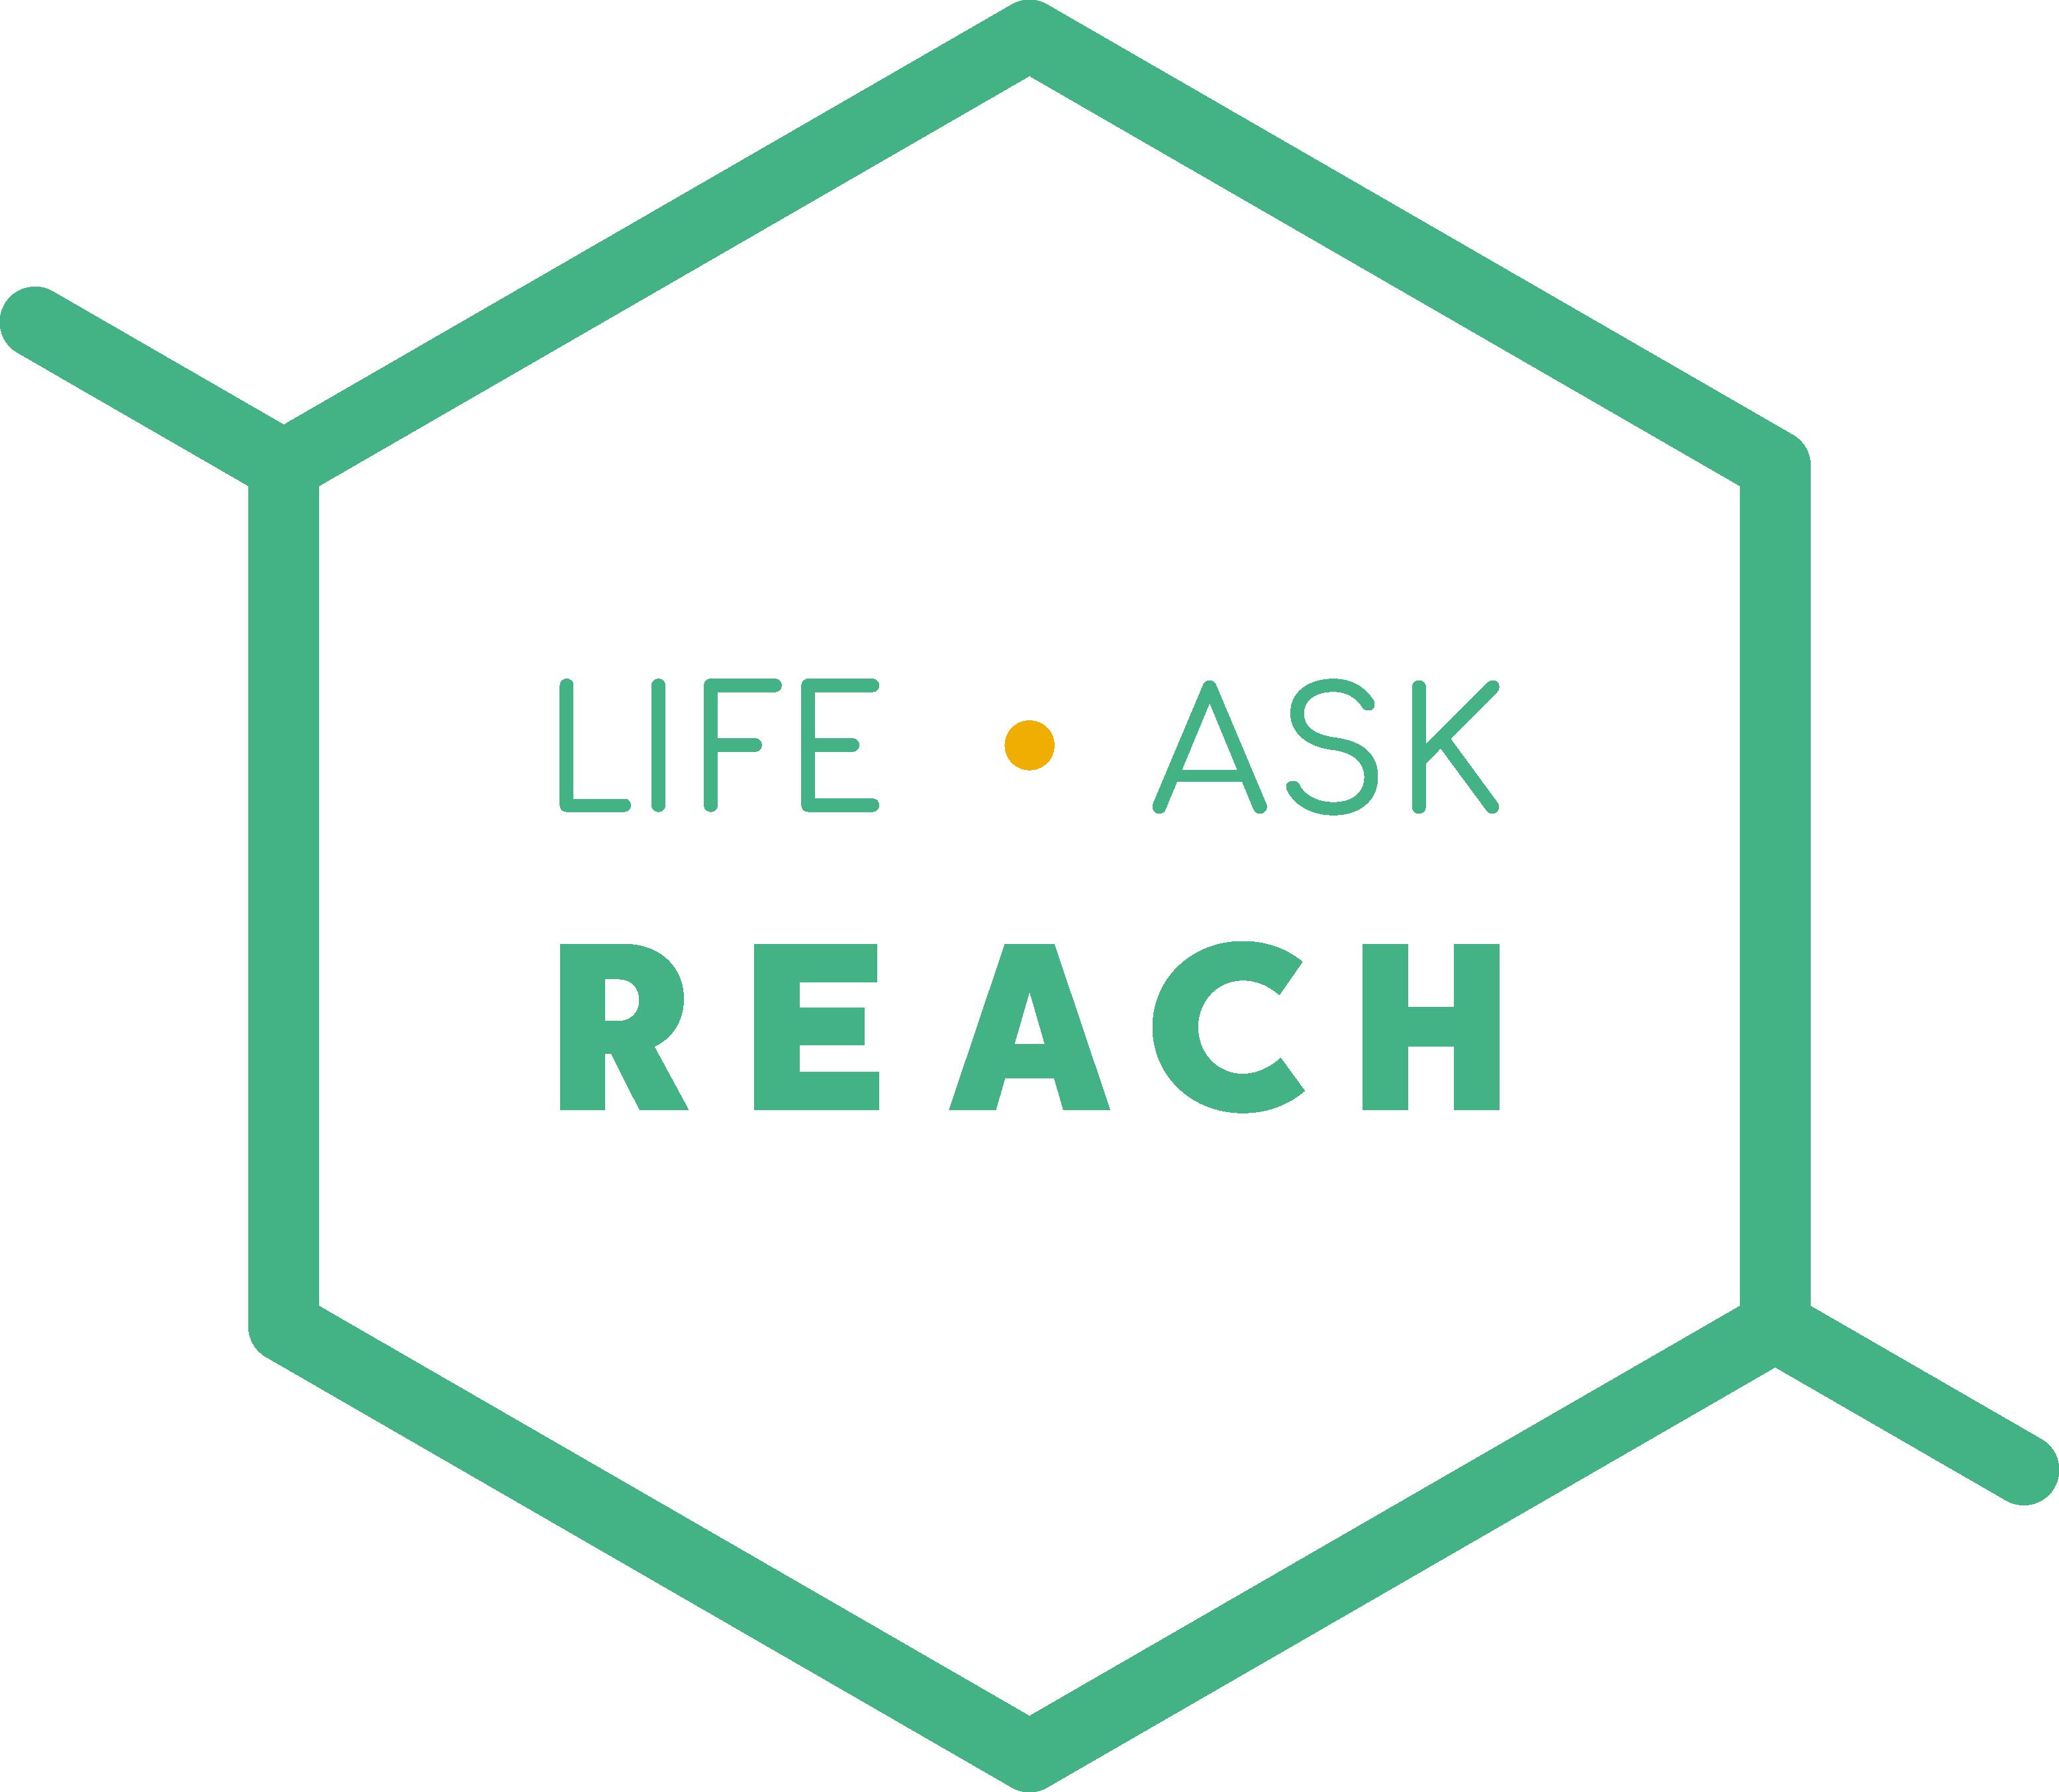 LIFE ASK REACH - Logo